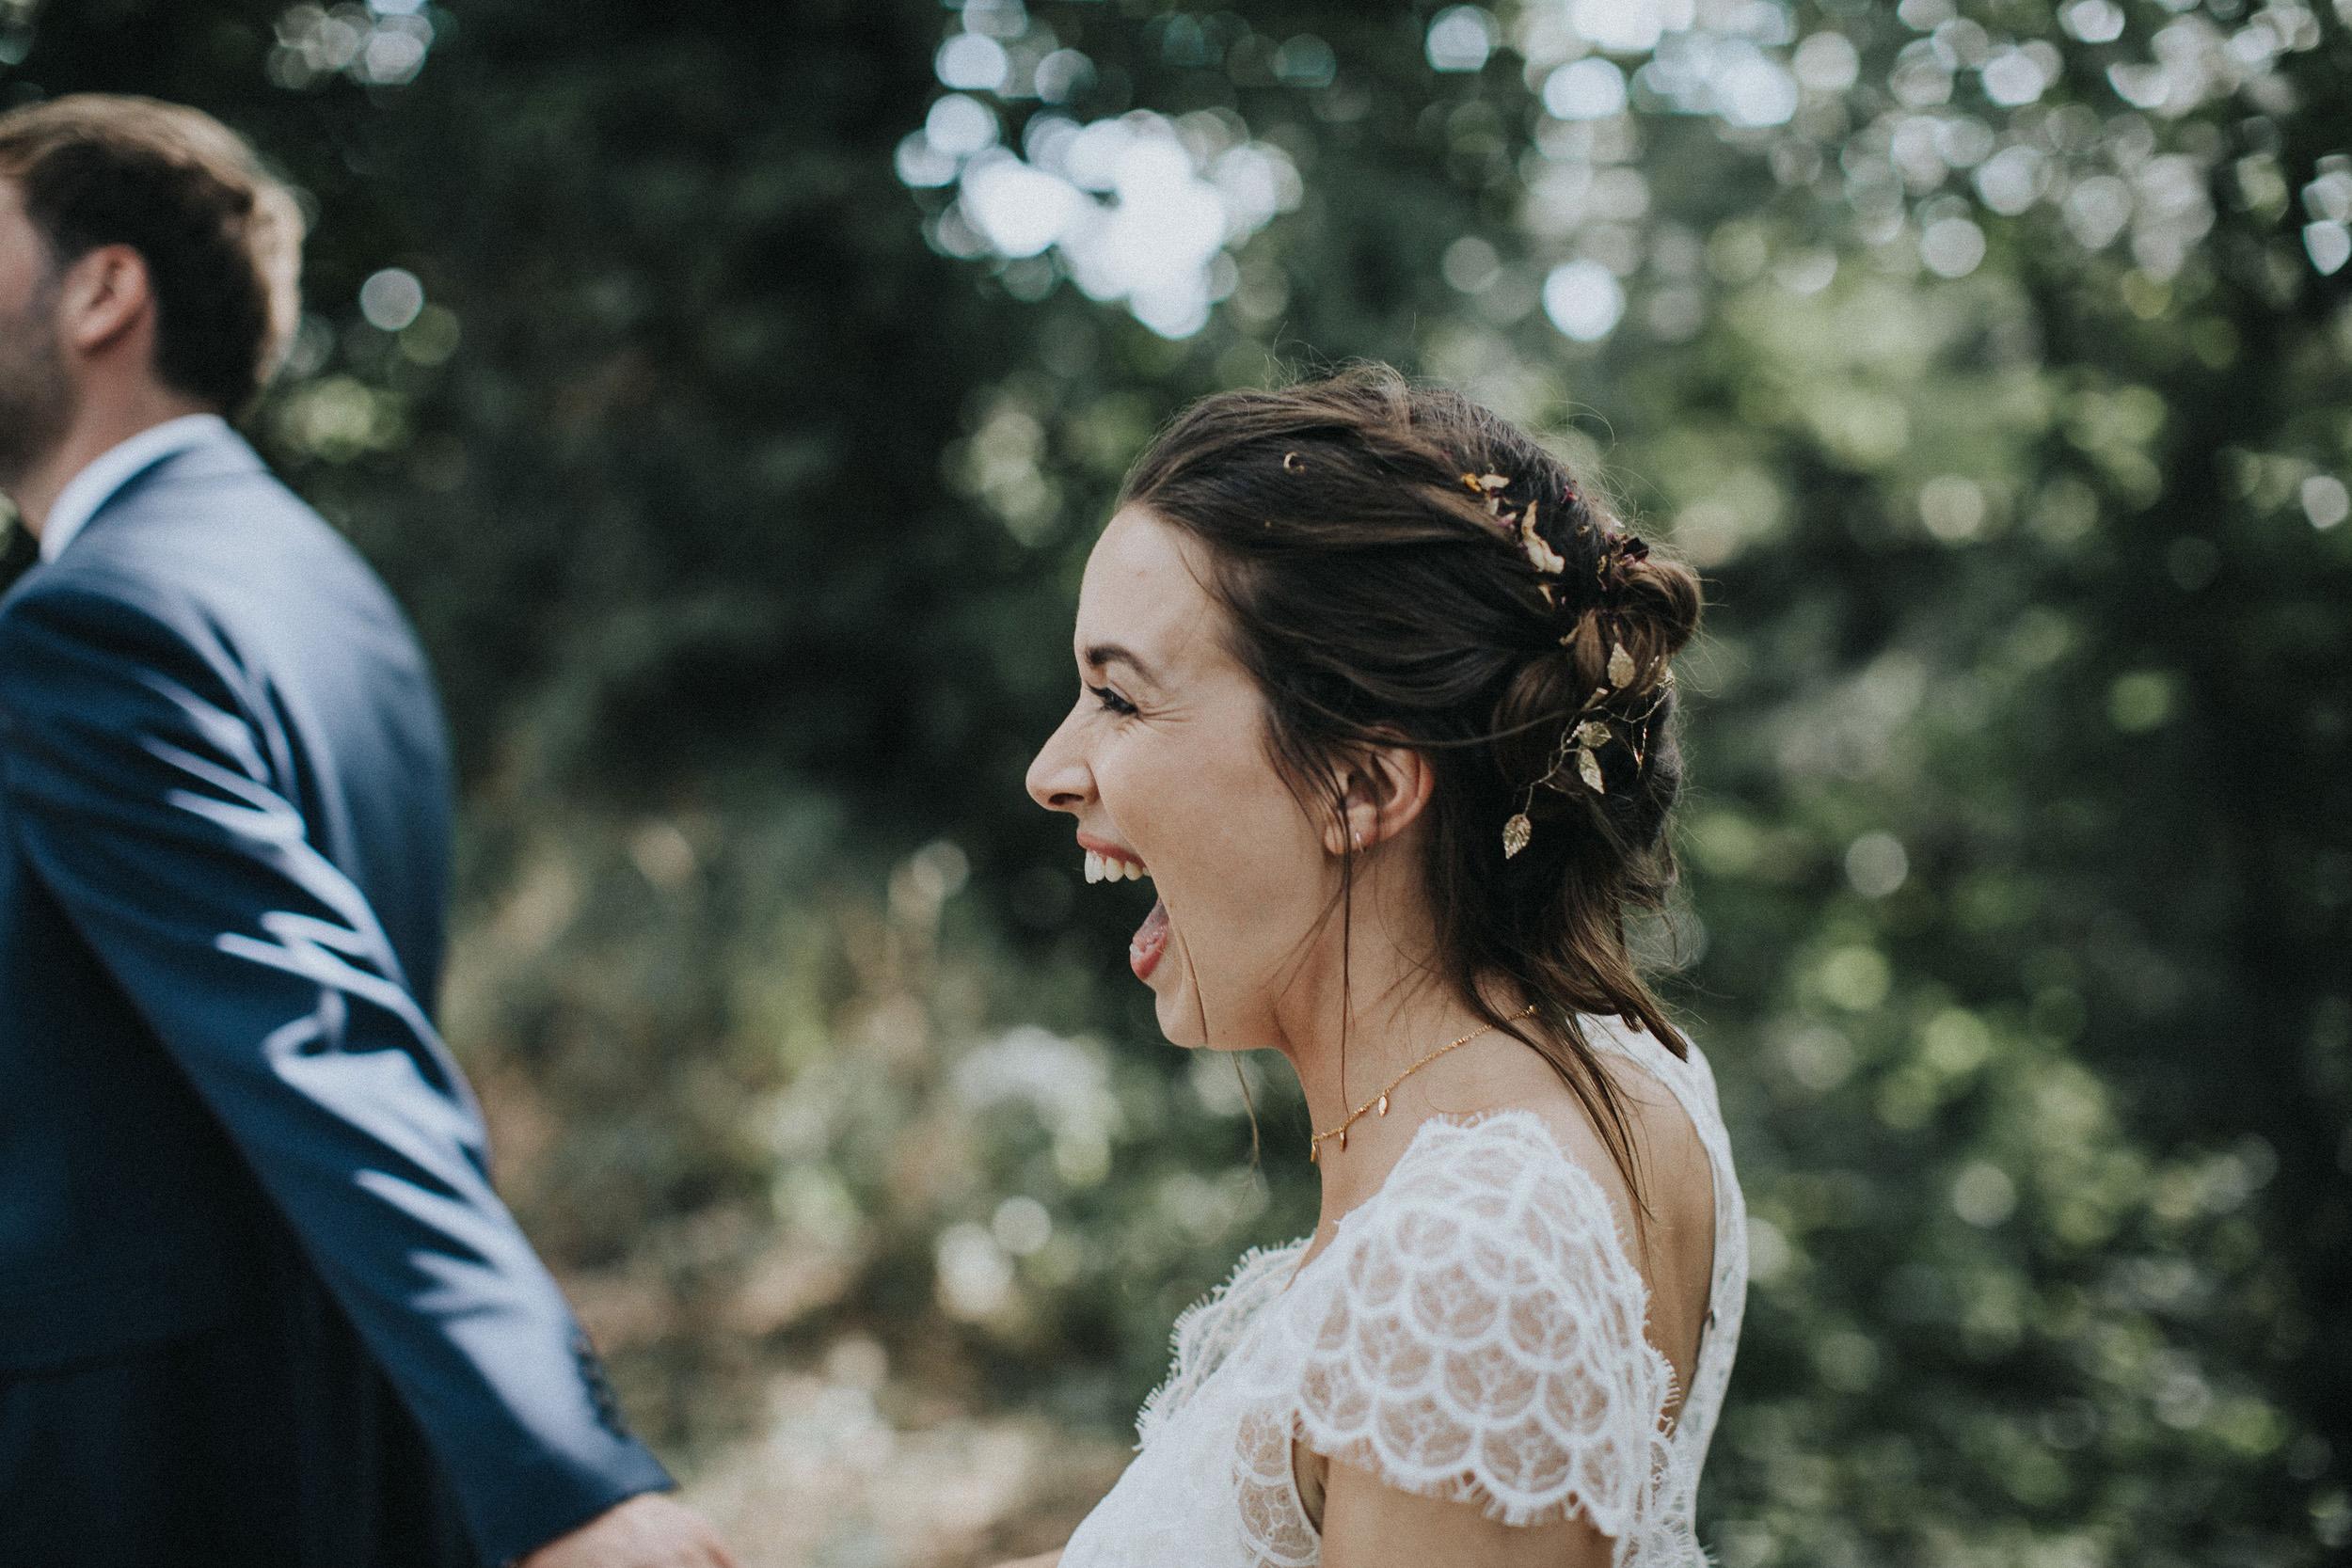 Martha-Laid-Back-Garden-Wedding-Lace-Wedding-Dress-Bohemian-Kate-Beaumont-35.jpg